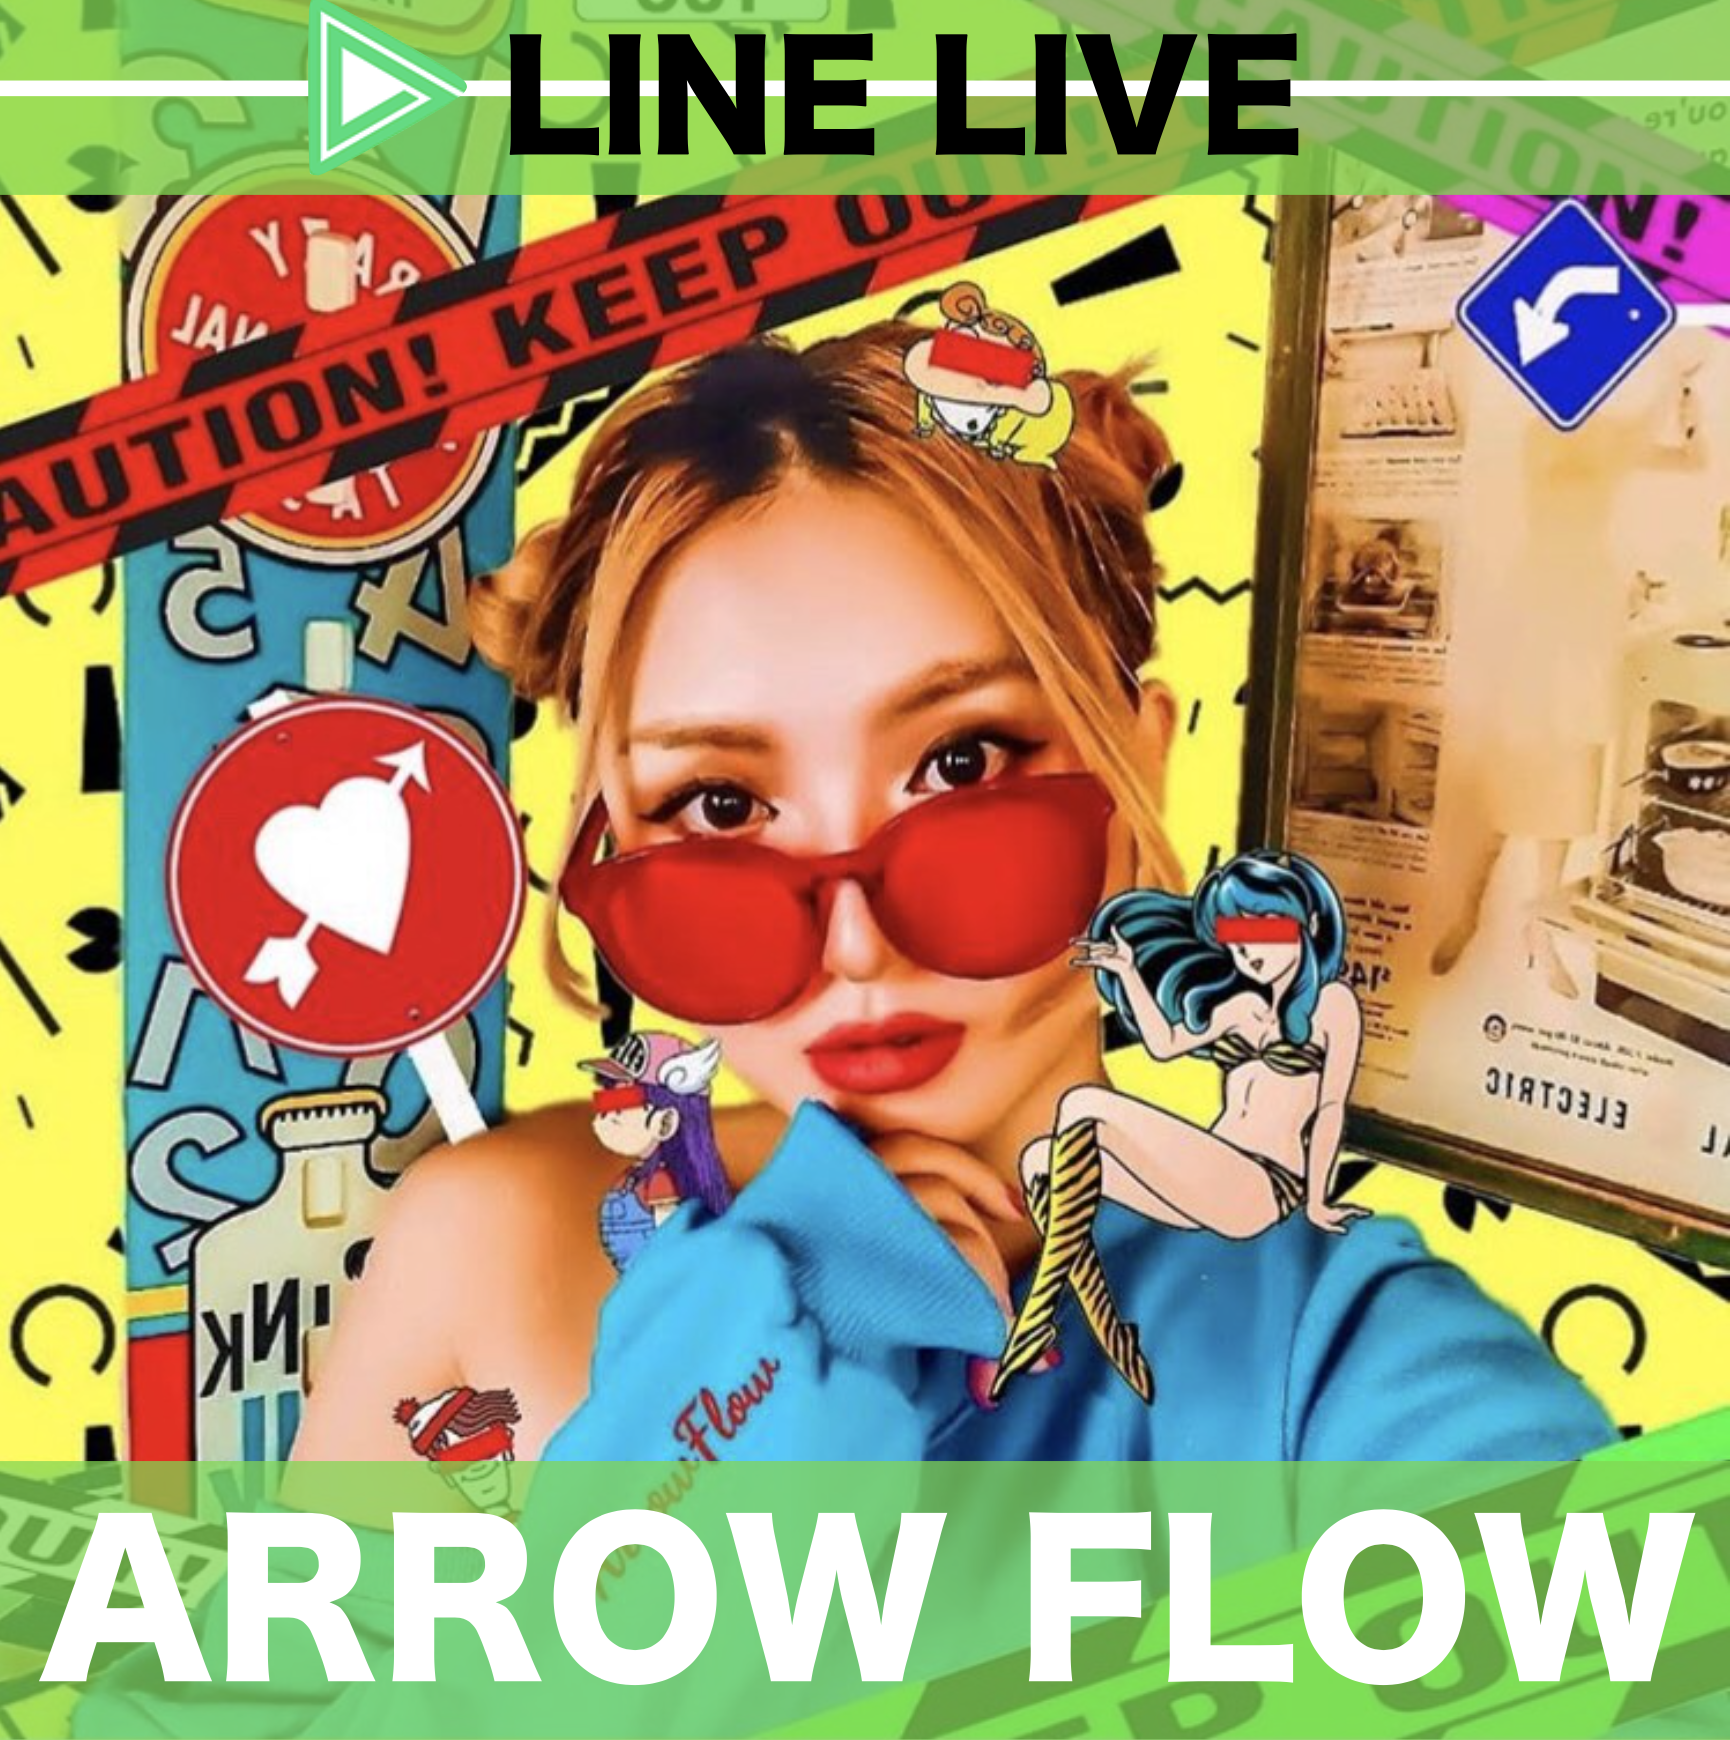 Arrow Flow (LINE LIVE)